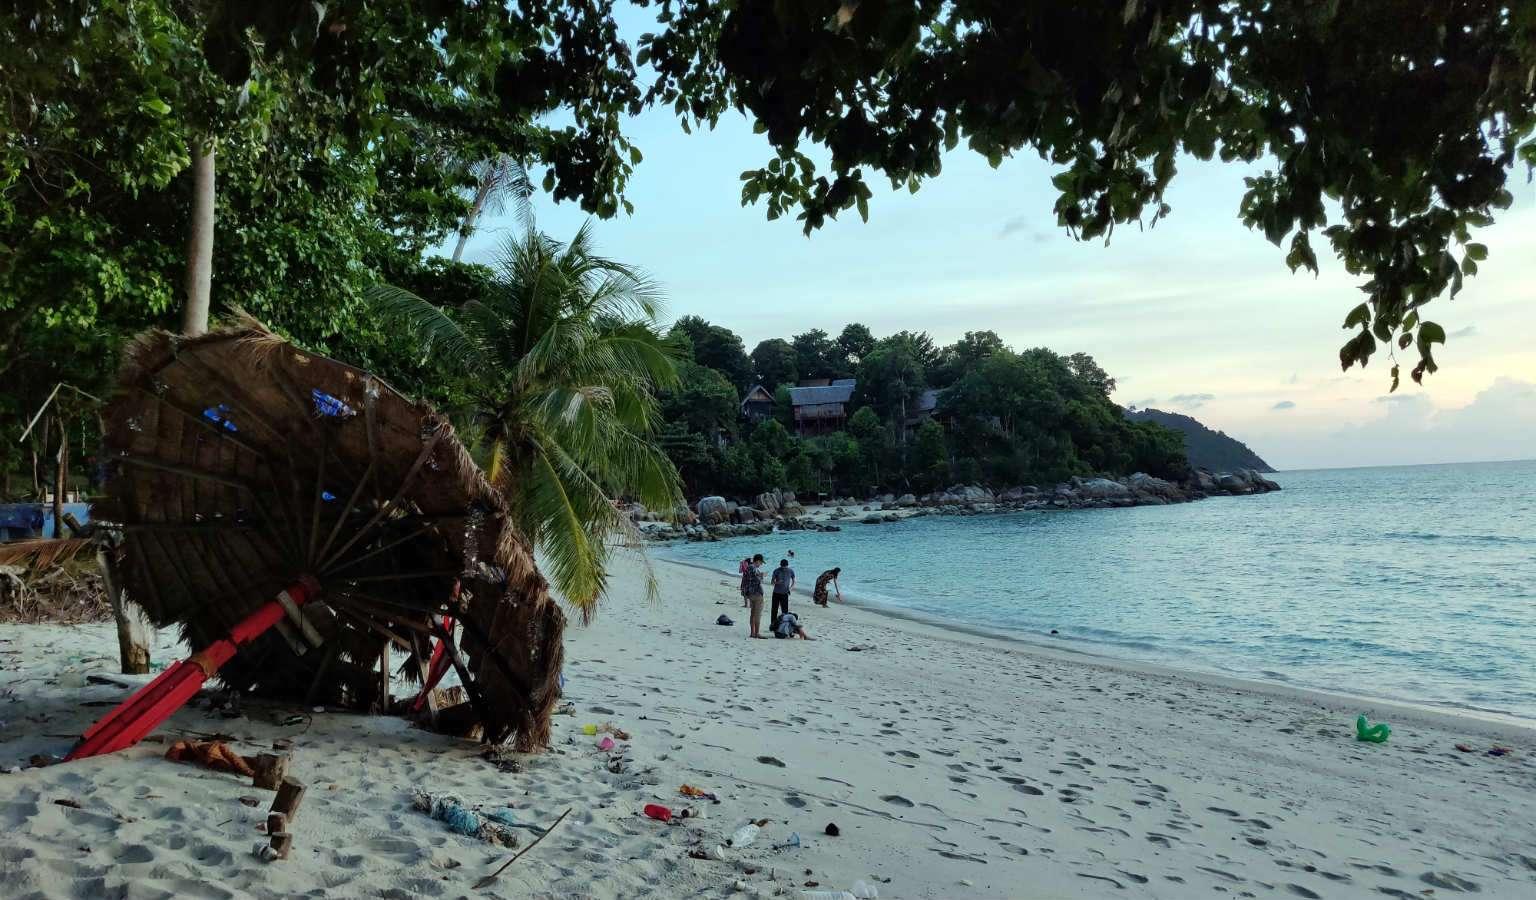 Sunset Beach in Ko Lipe, Thailand